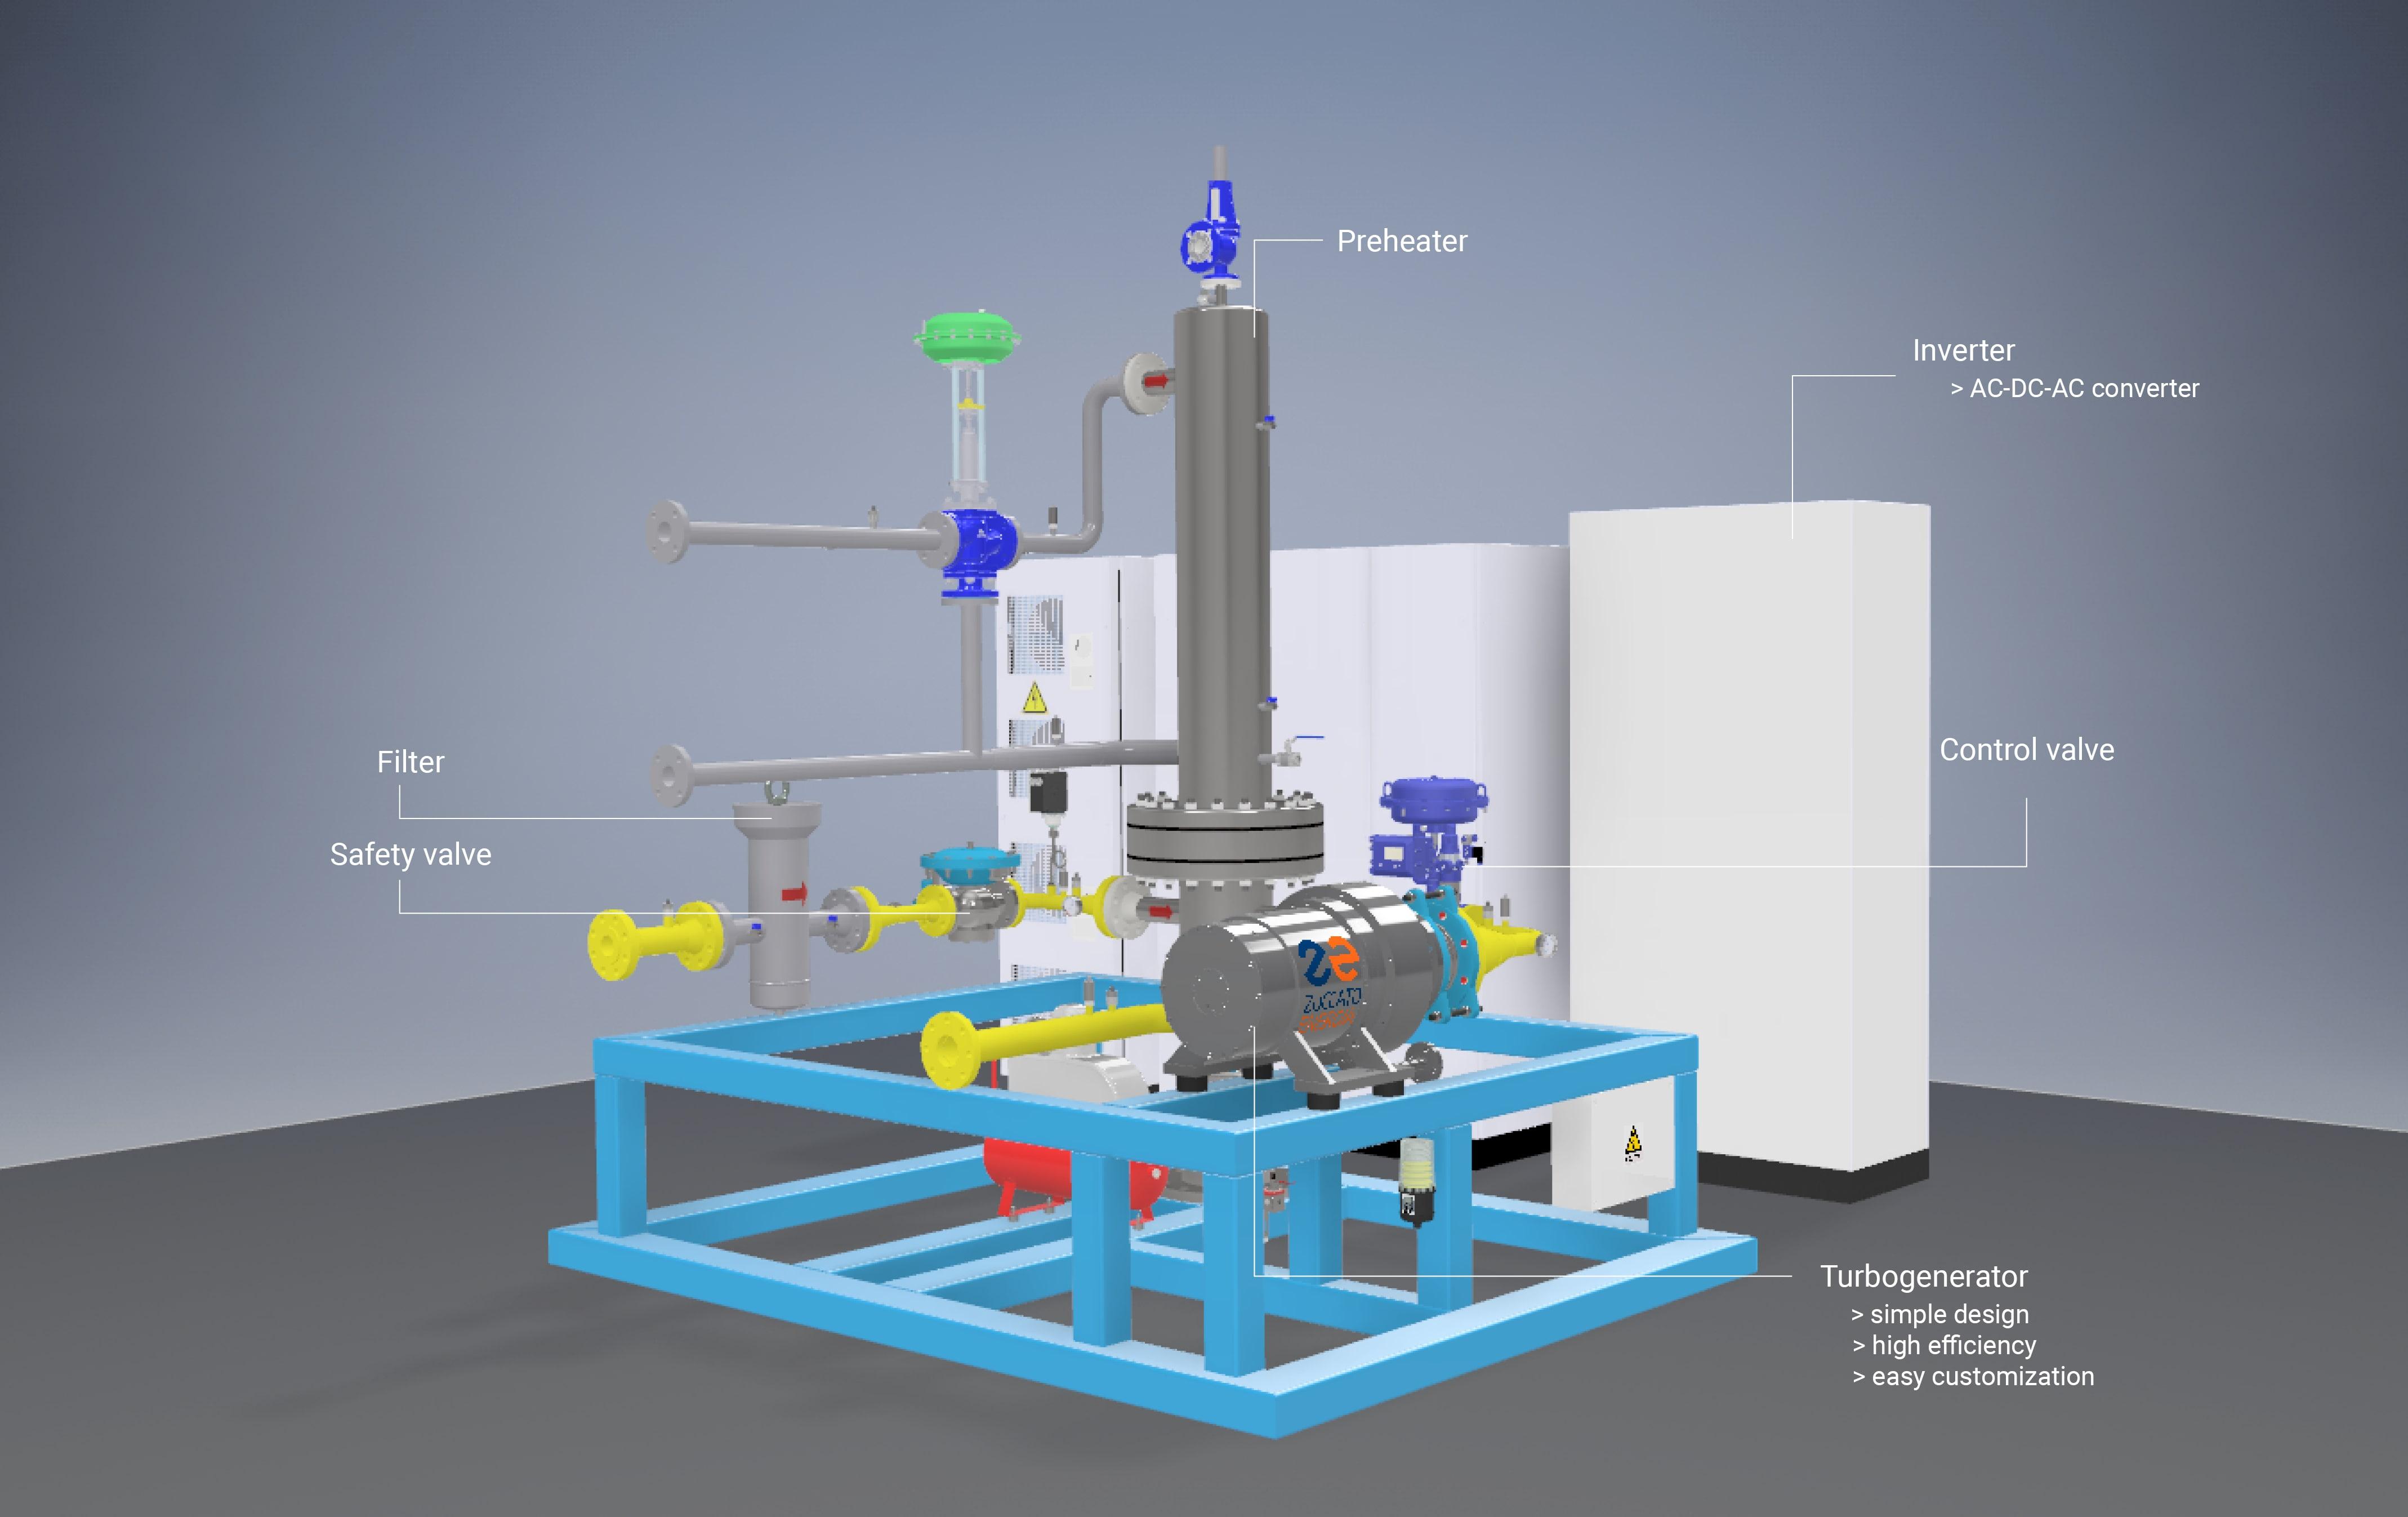 Turboexpander_Gas expander